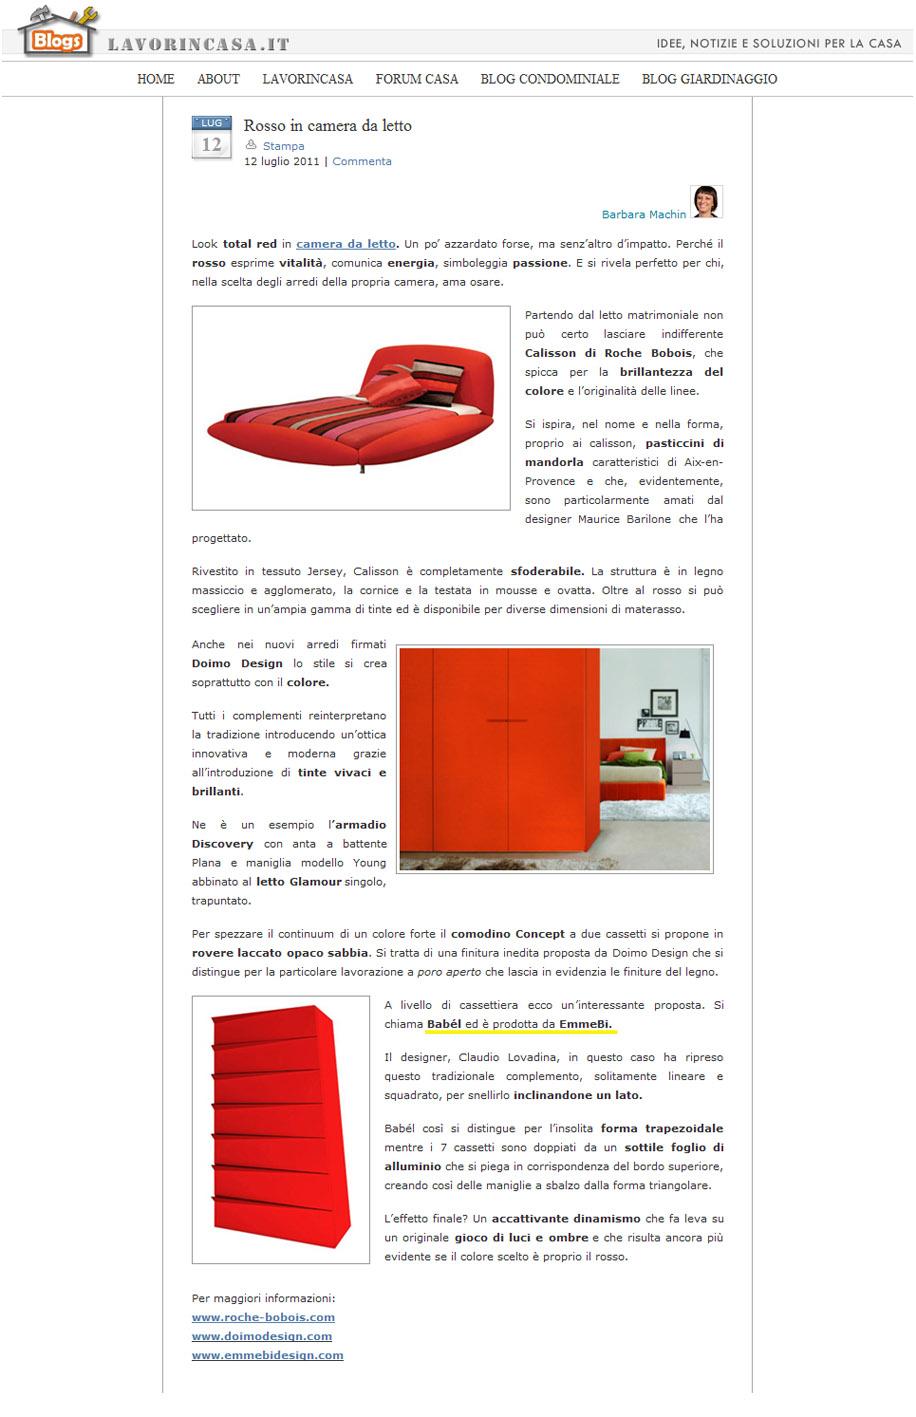 www.blog.lavorincasa.it 12 Luglio 11.jpg